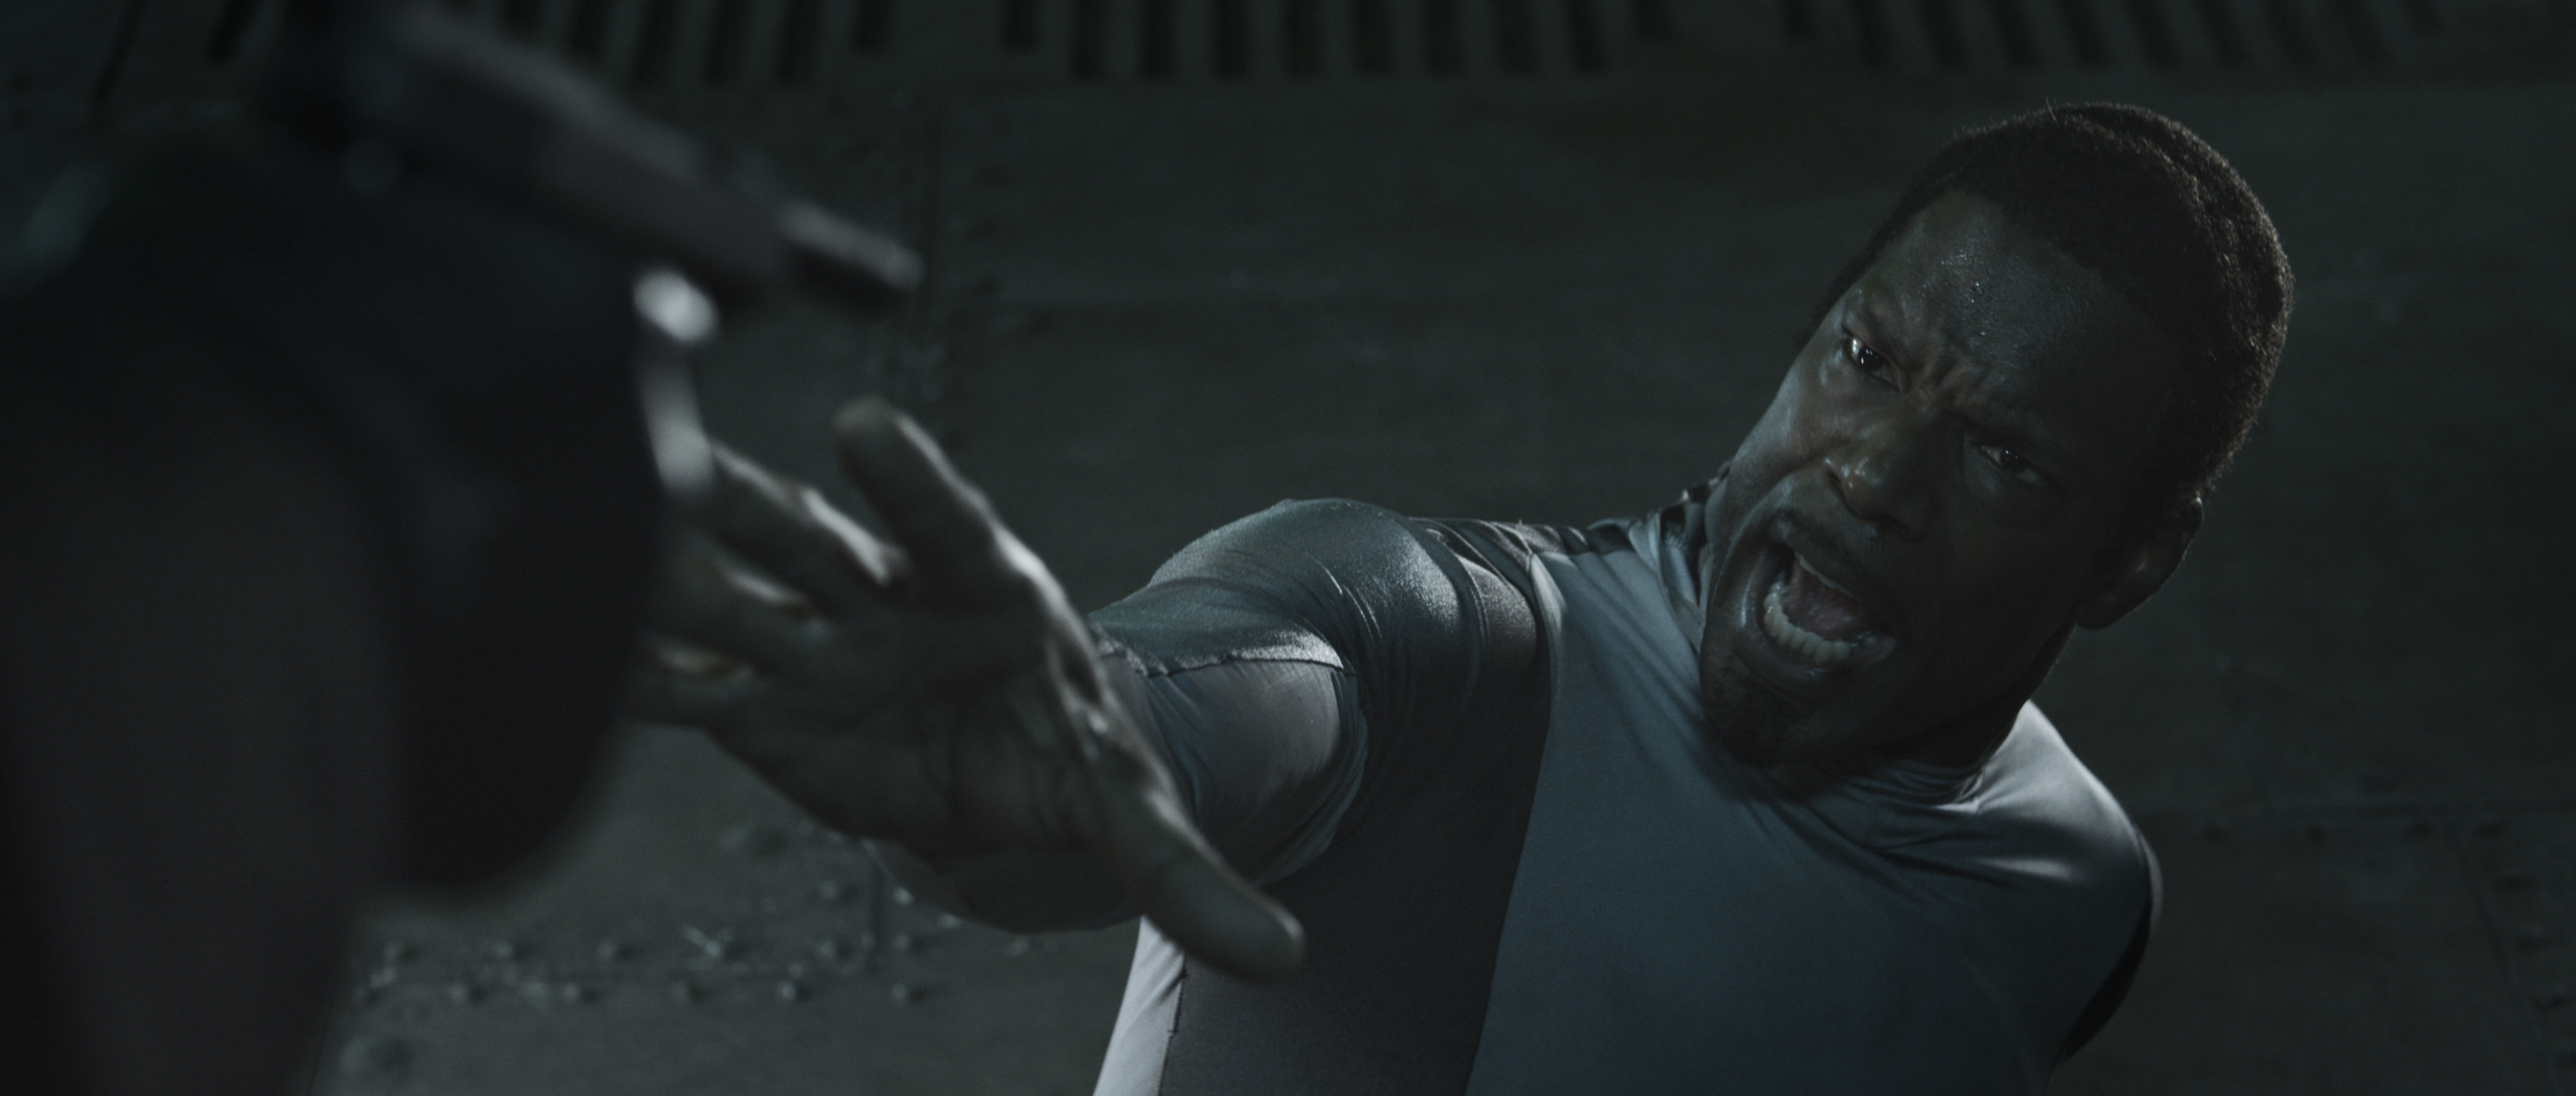 кадры из фильма Железное небо